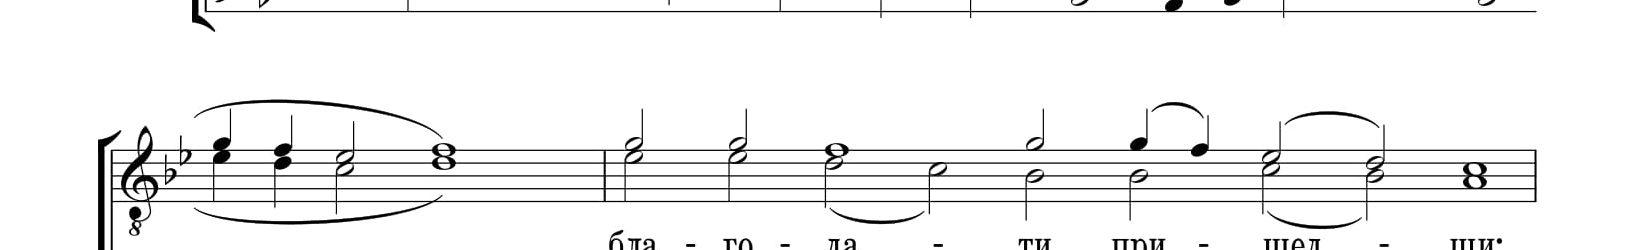 Догматик, глас 2 (Знаменный) — Full Score